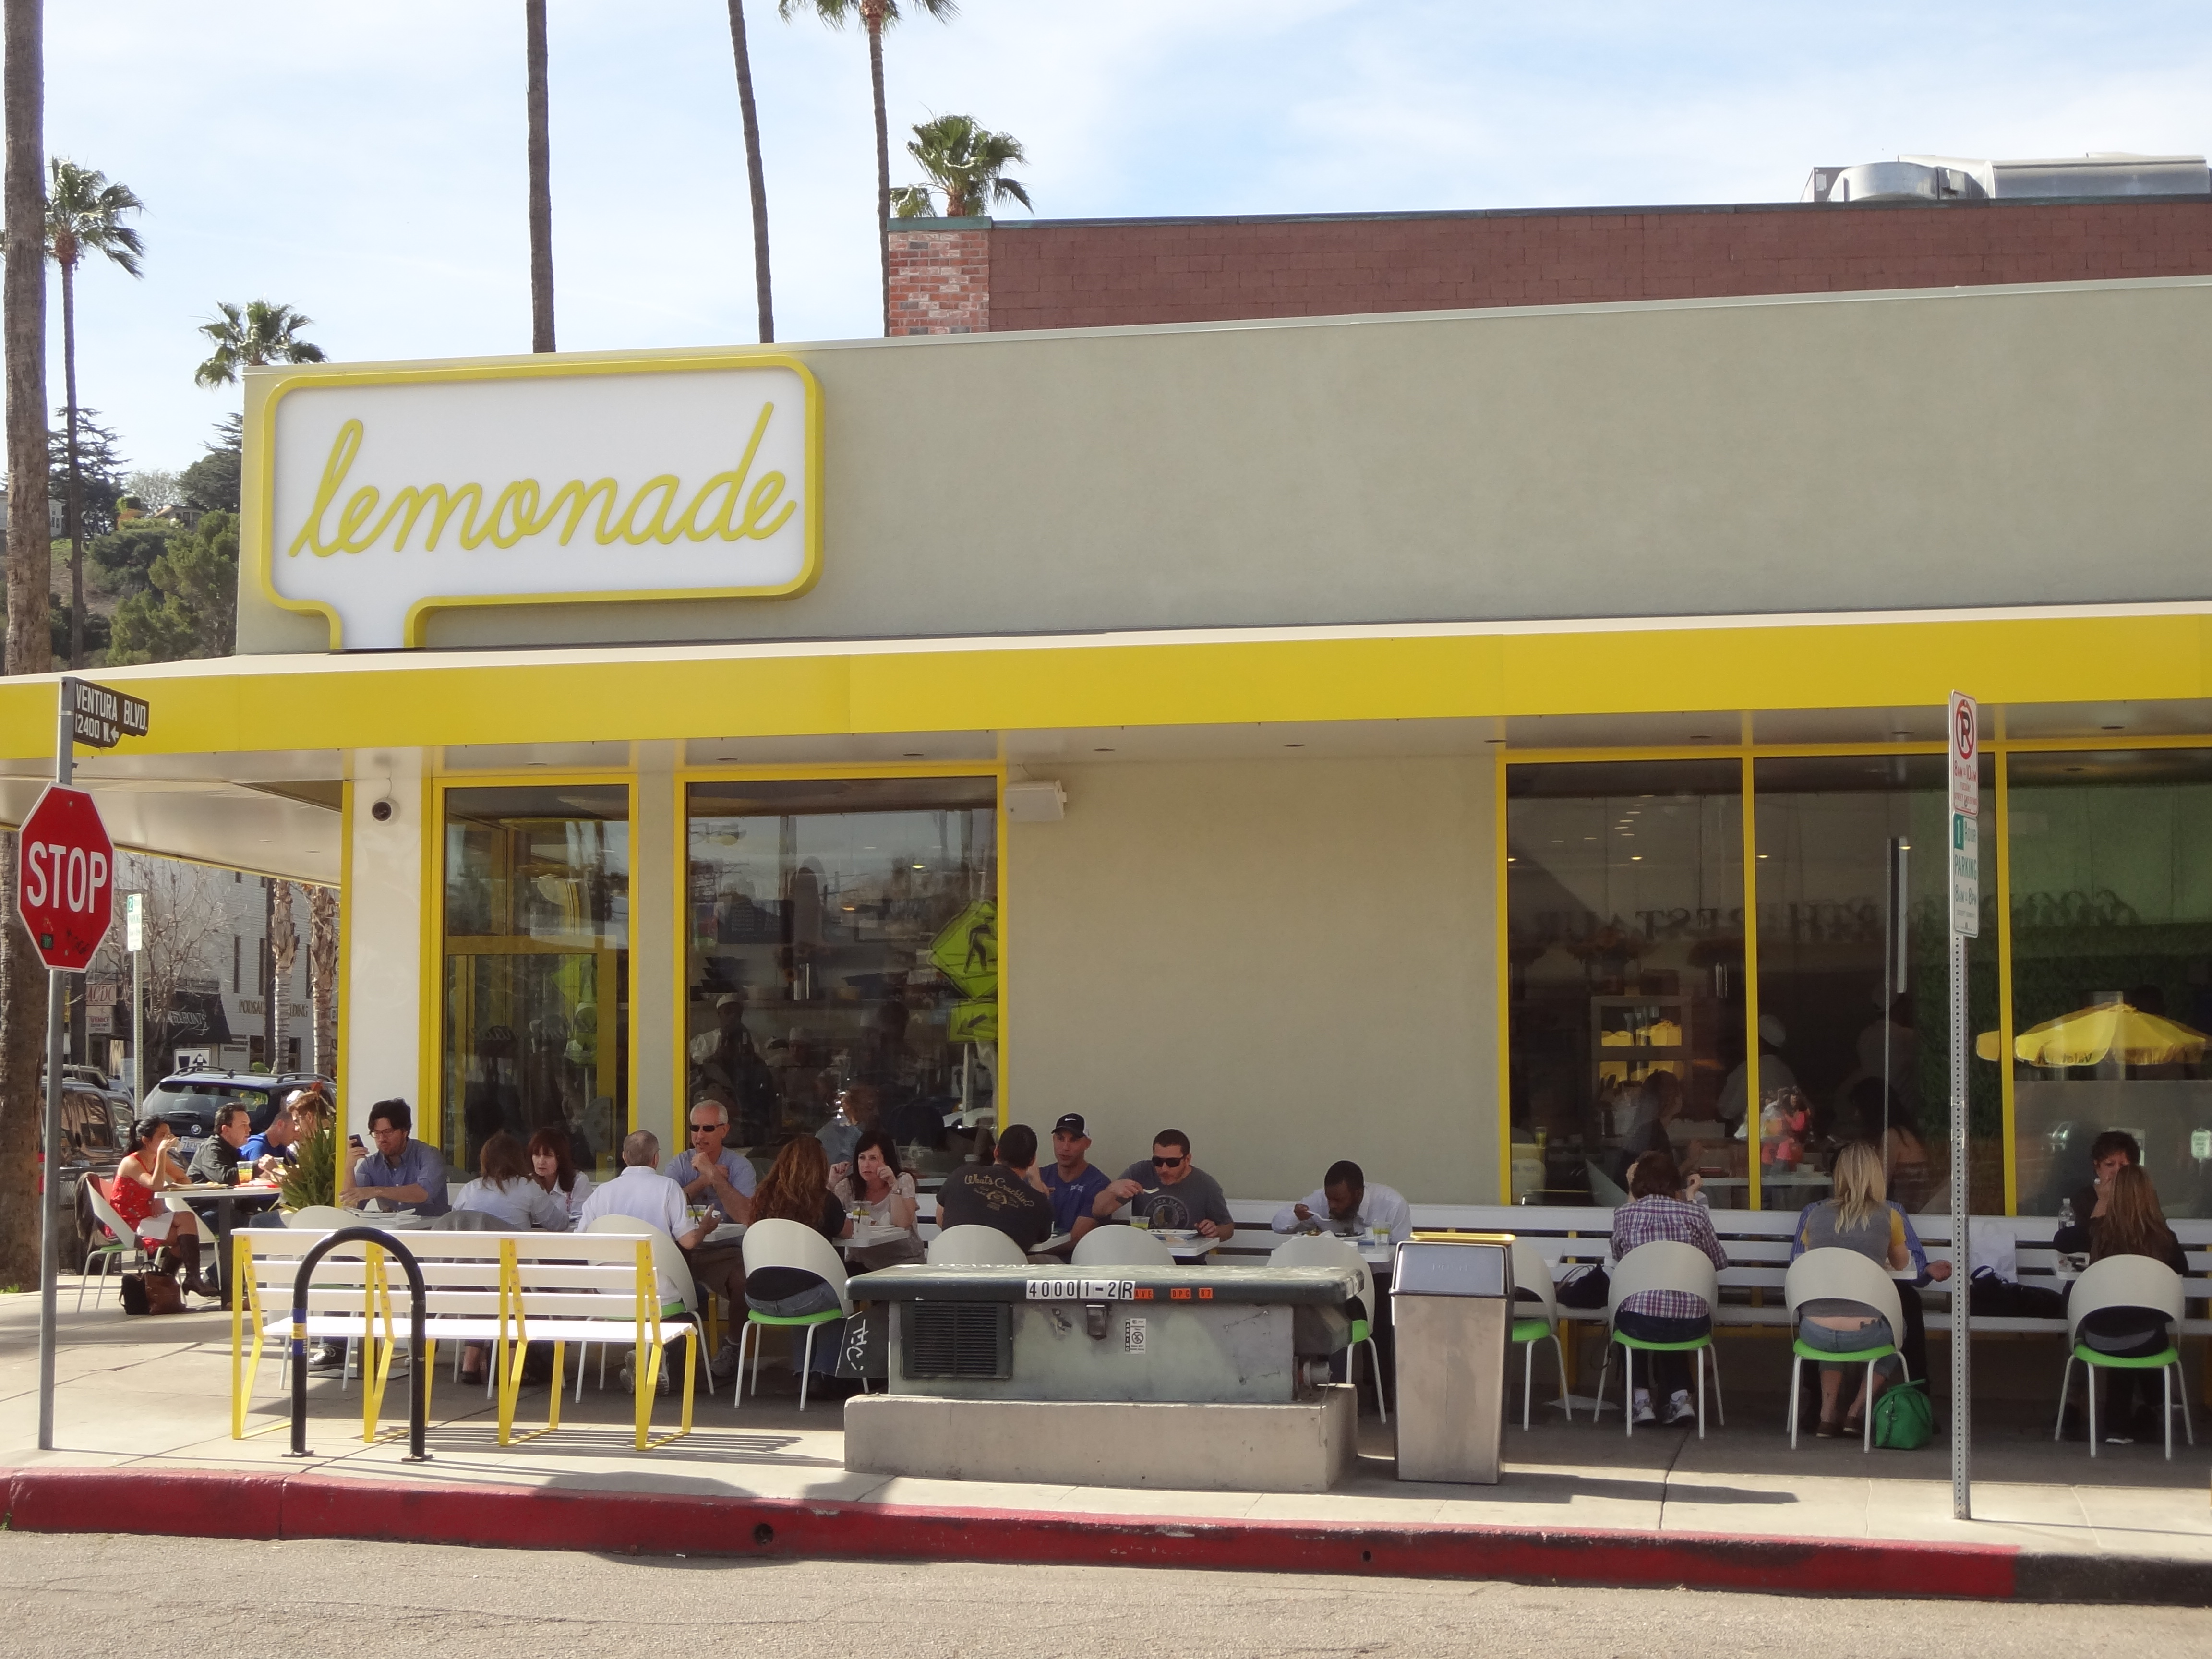 Lemonade Studio City - outdoors